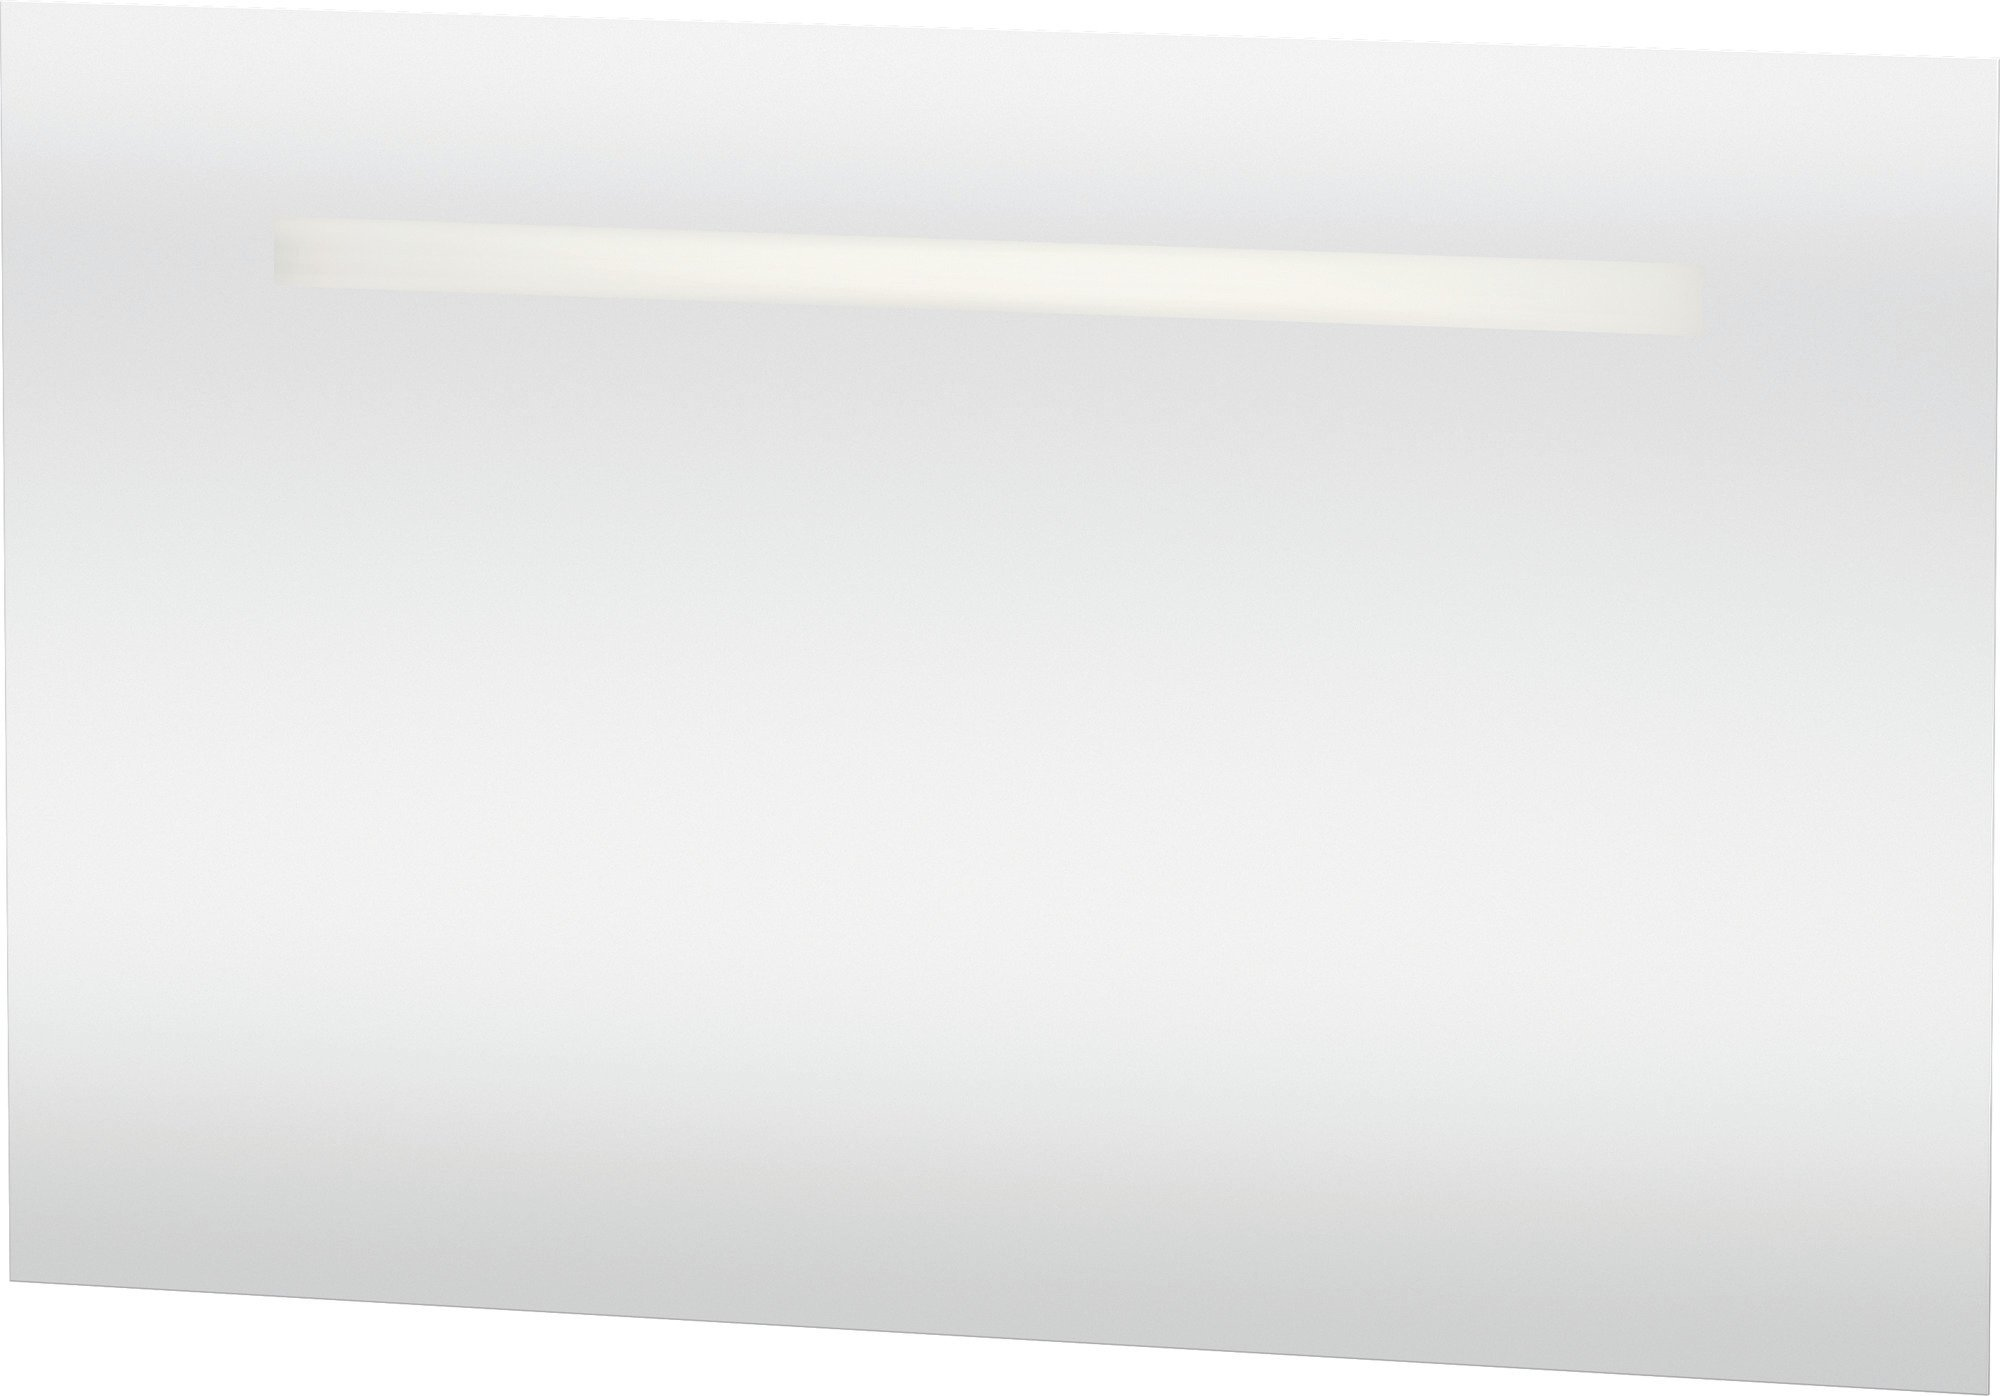 Duravit Ketho Spiegel Silber n/a 1200